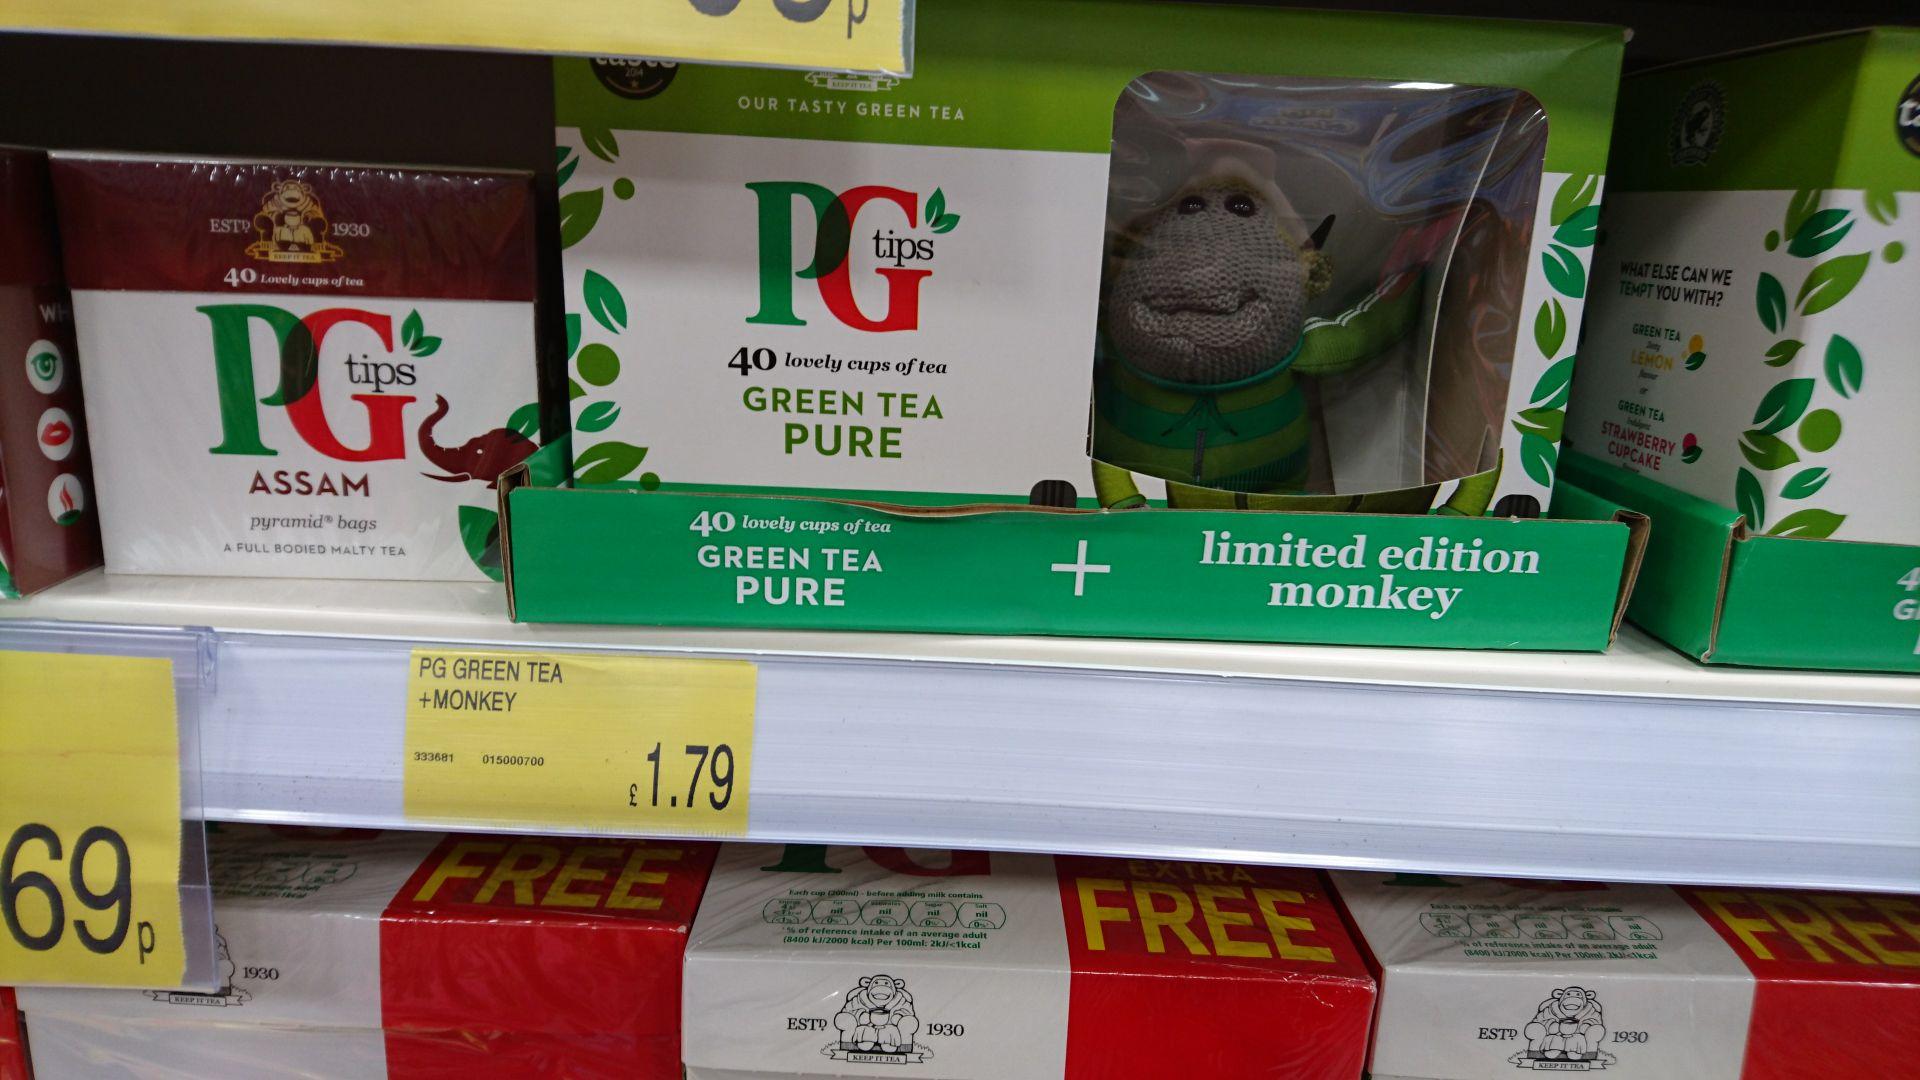 Pg tips green tea ( 40 pck)  + monkey b & m Bromborough - £1.79